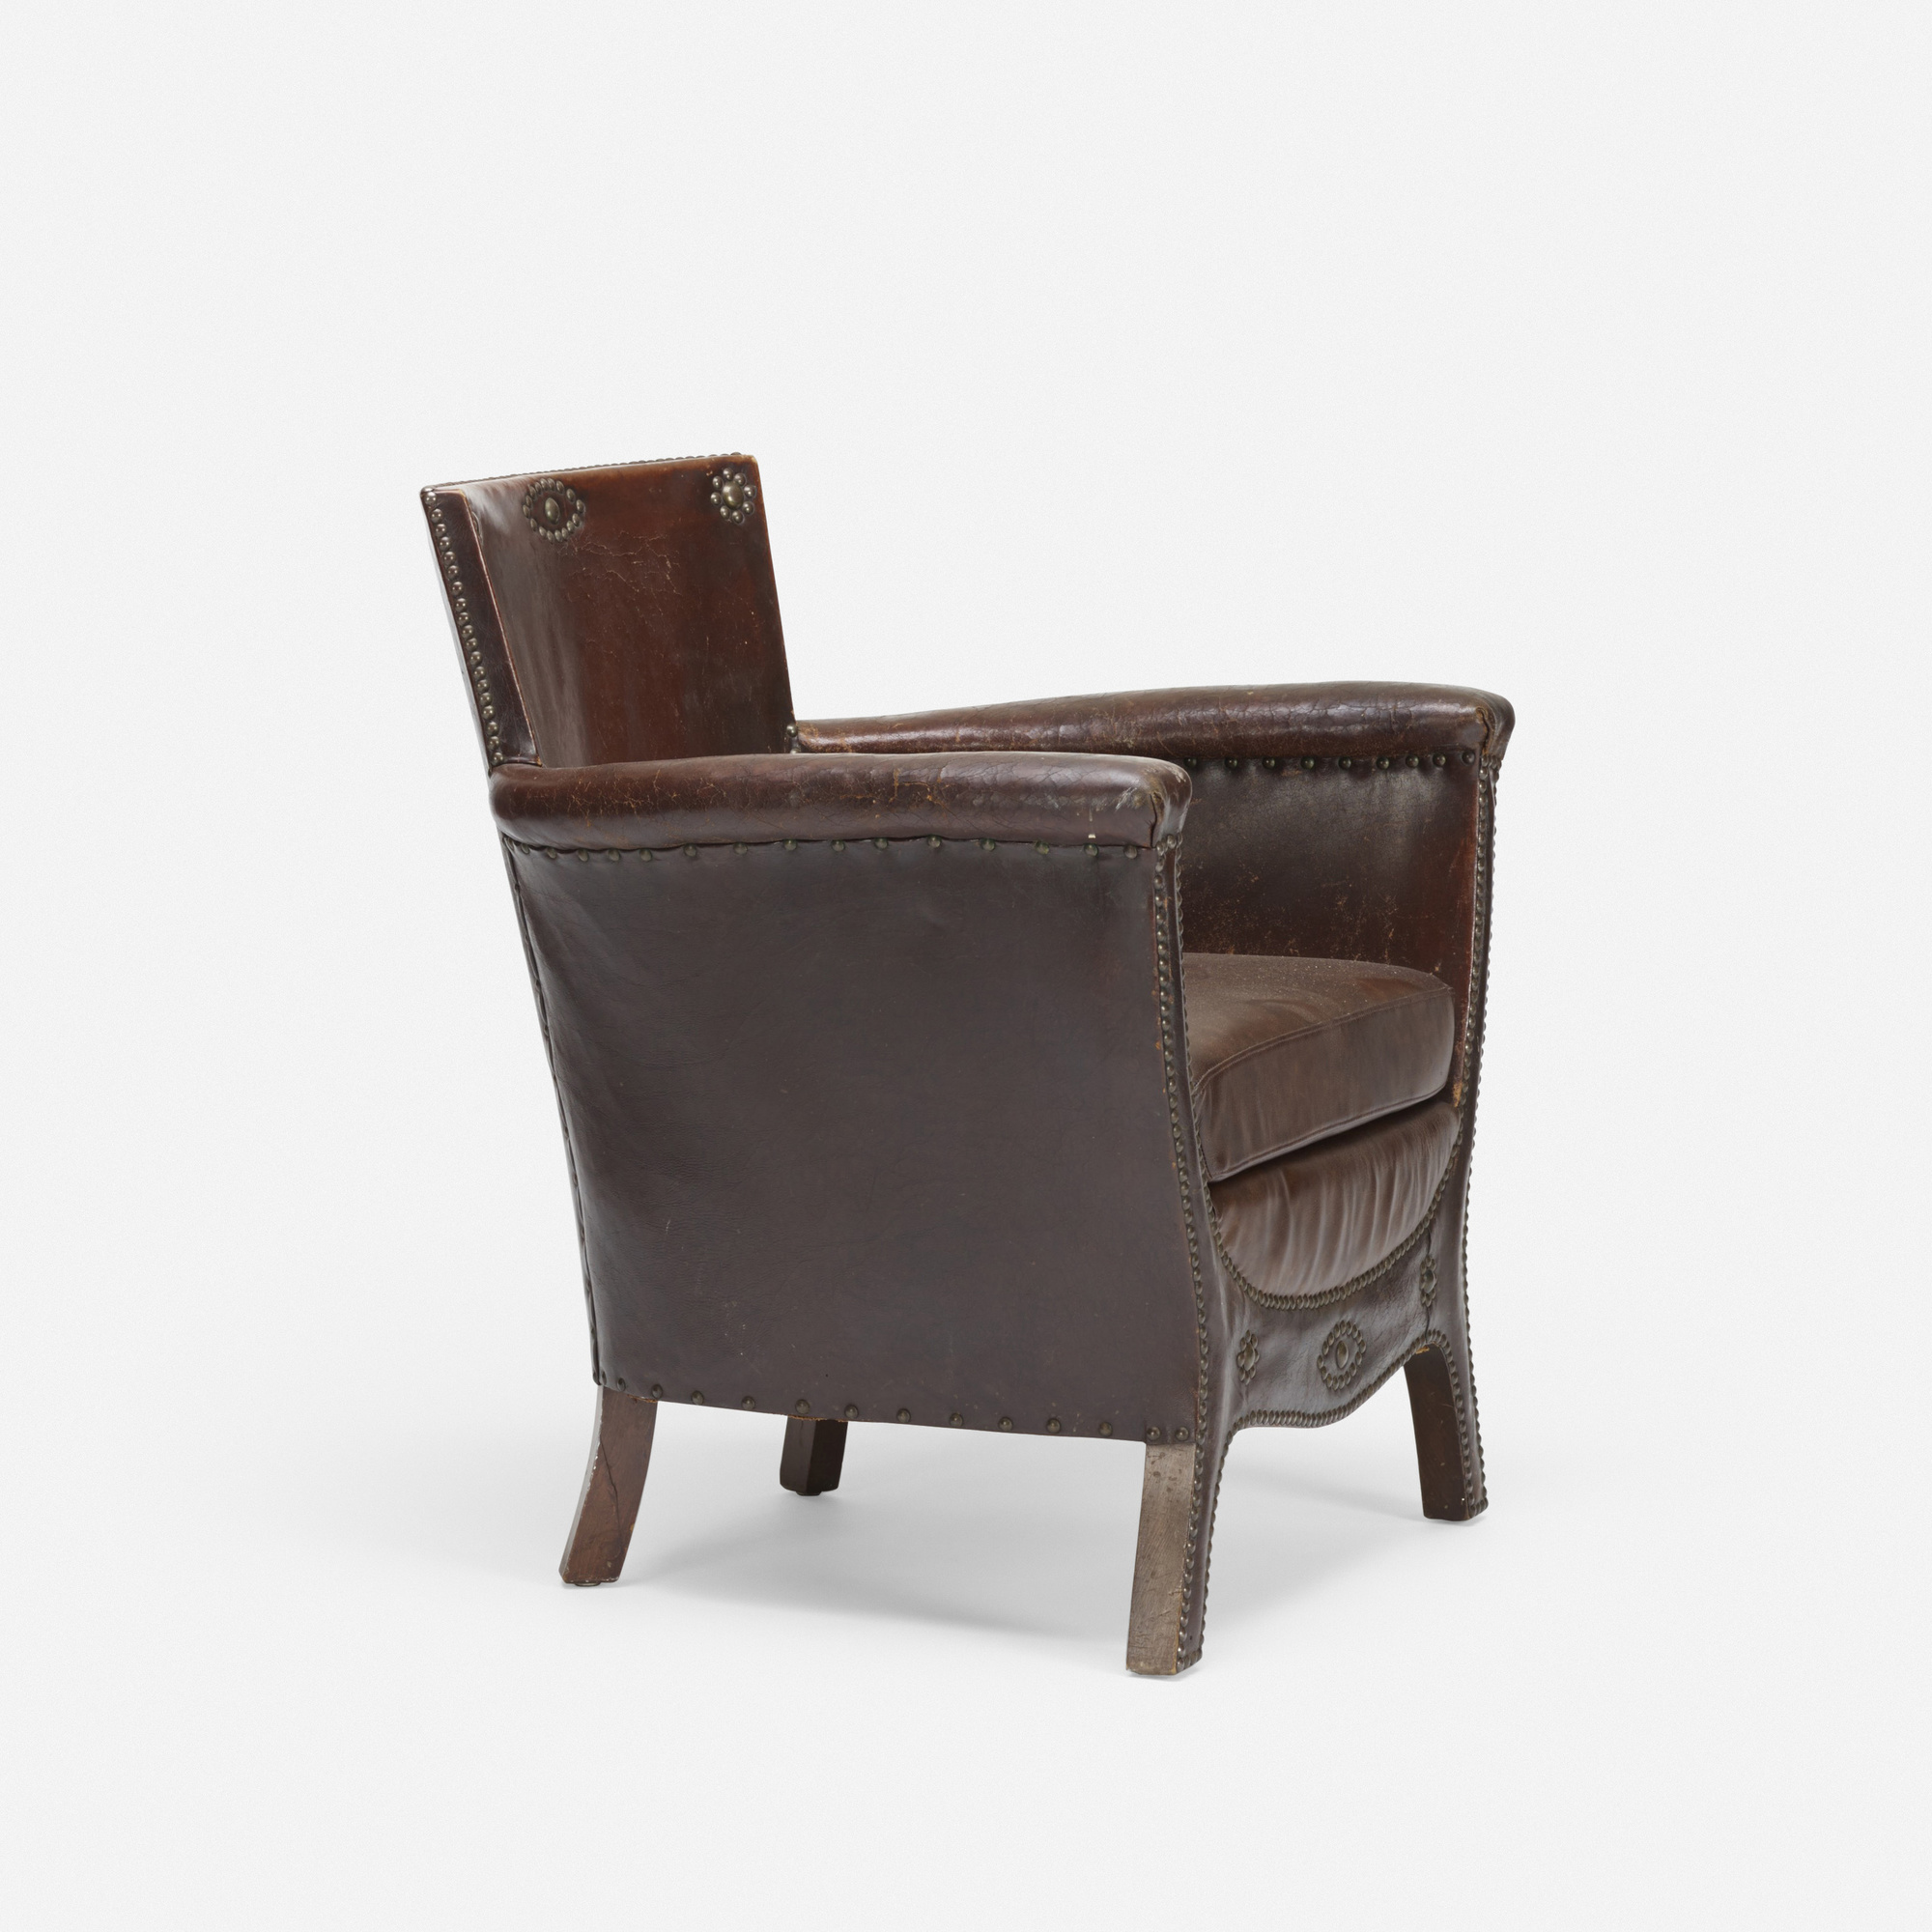 719: Otto Schulz / armchair (1 of 2)